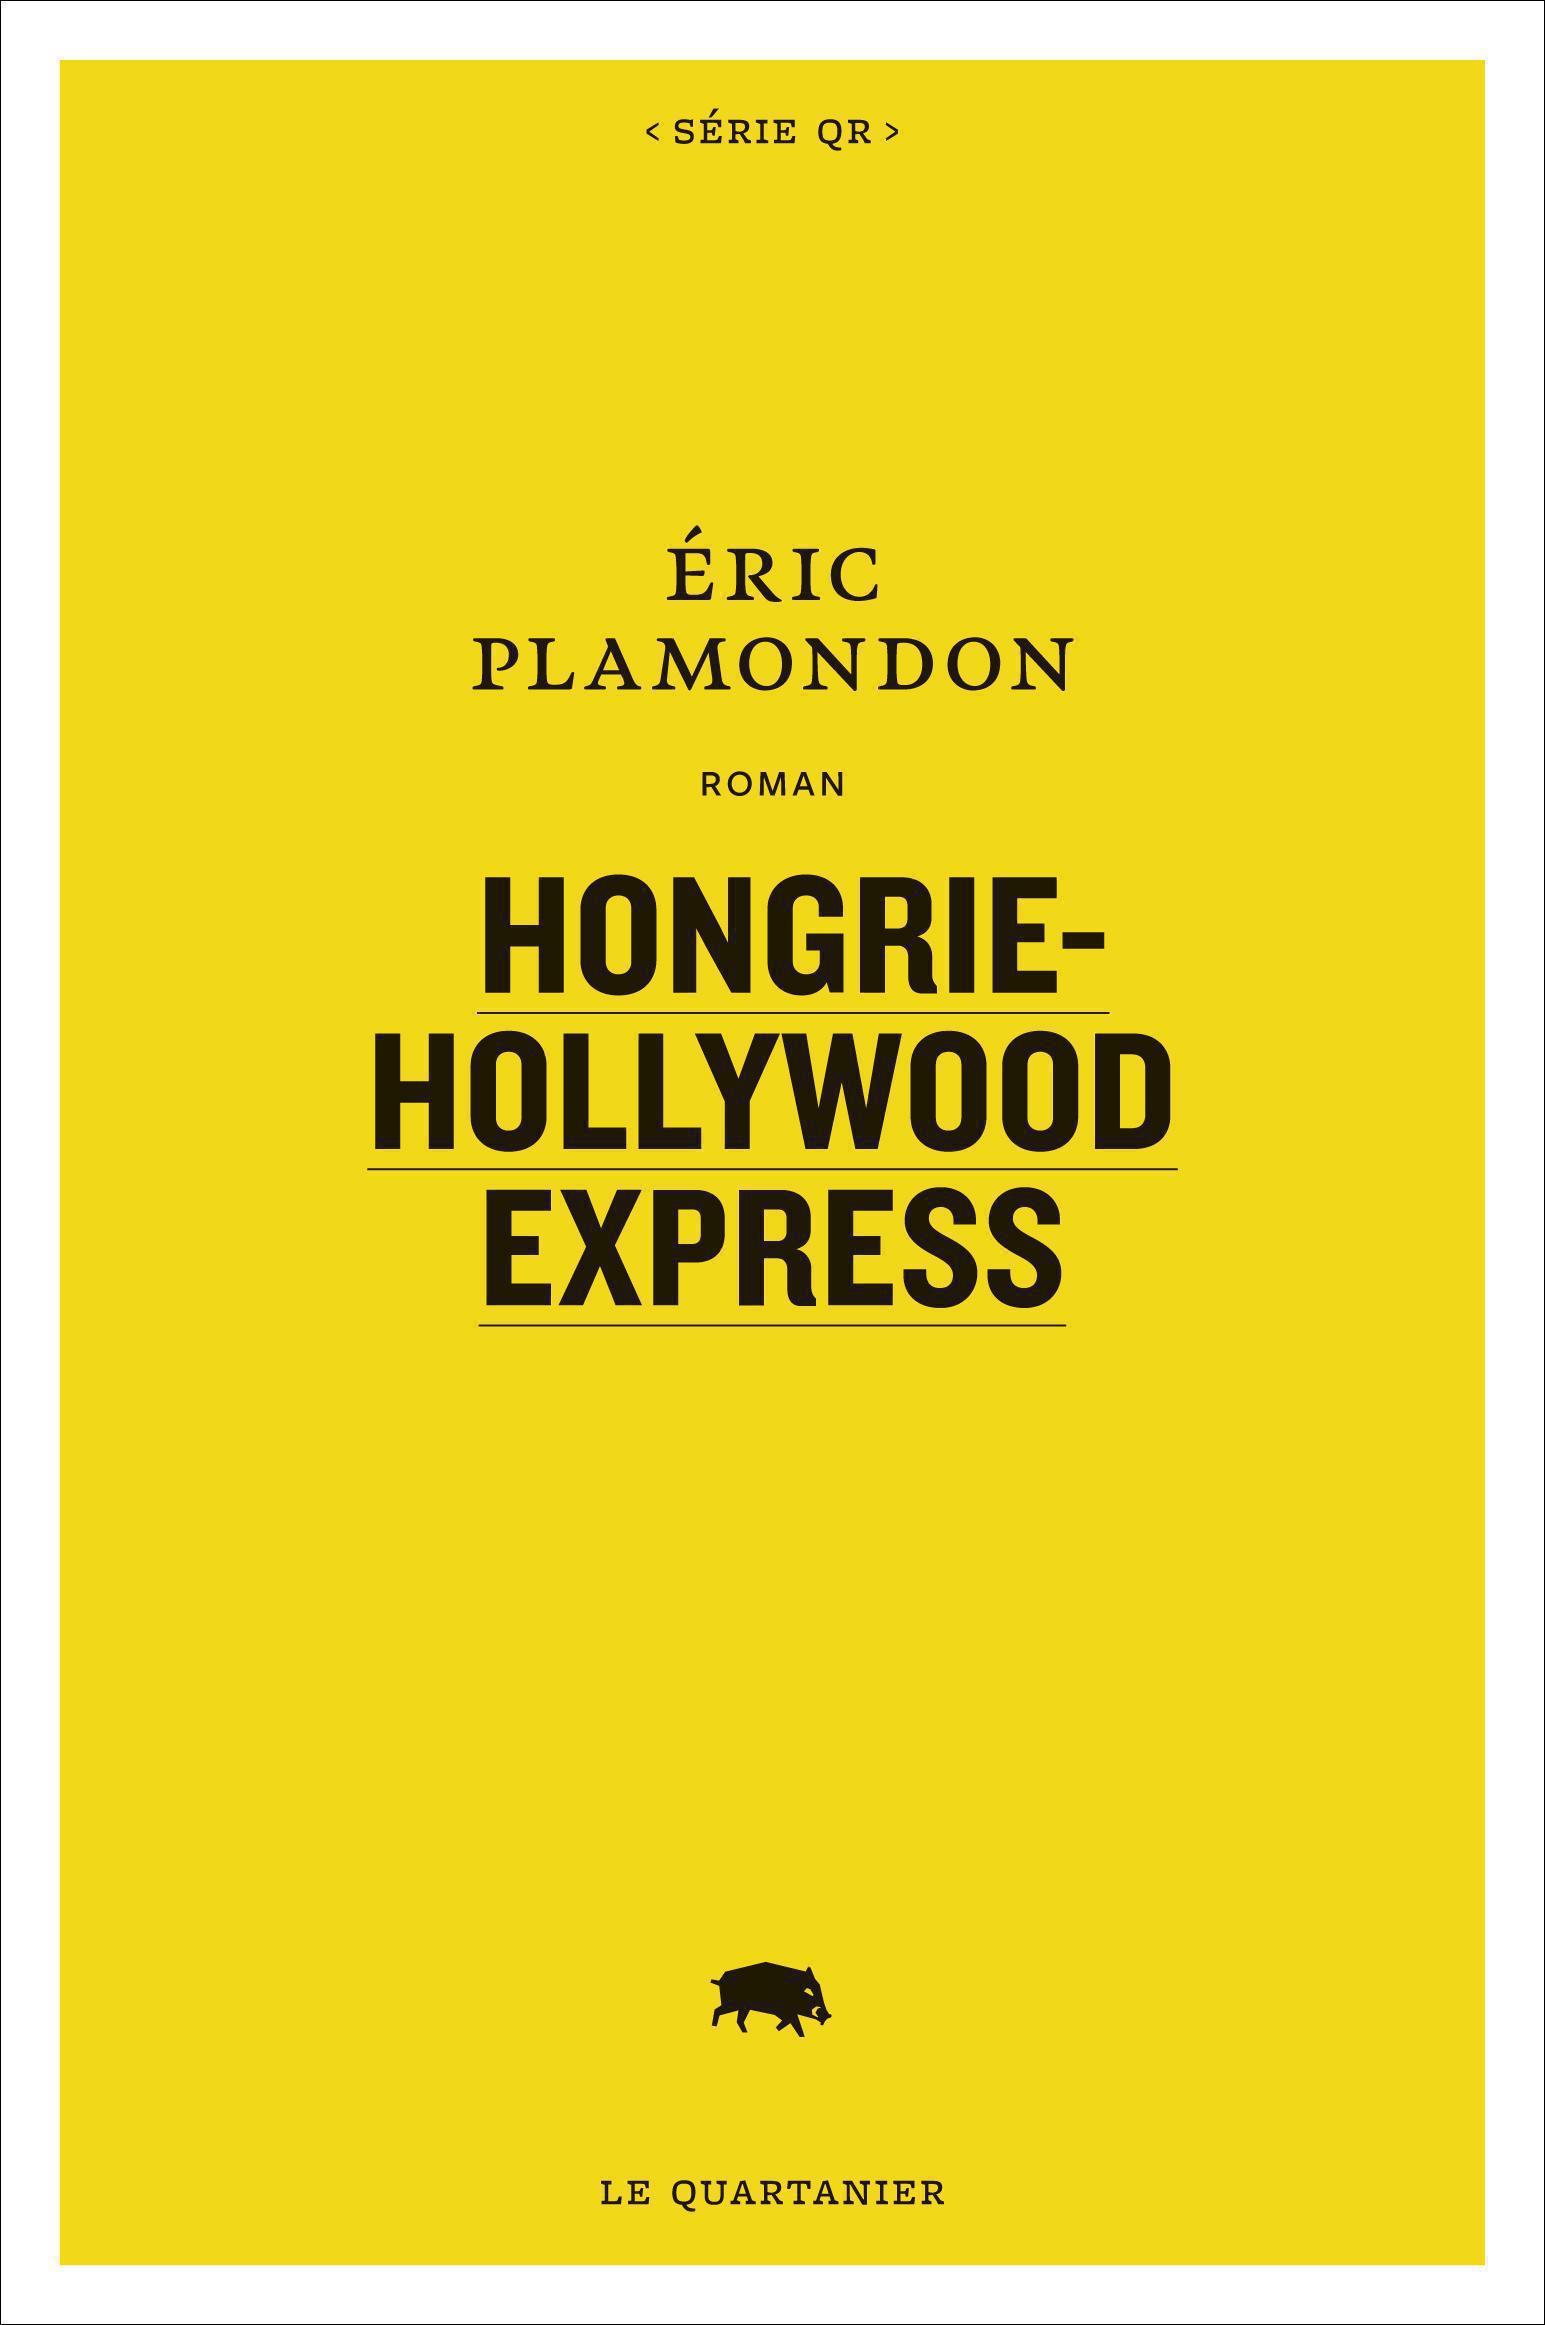 Couverture : Hongrie-Hollywood Express Eric Plamondon